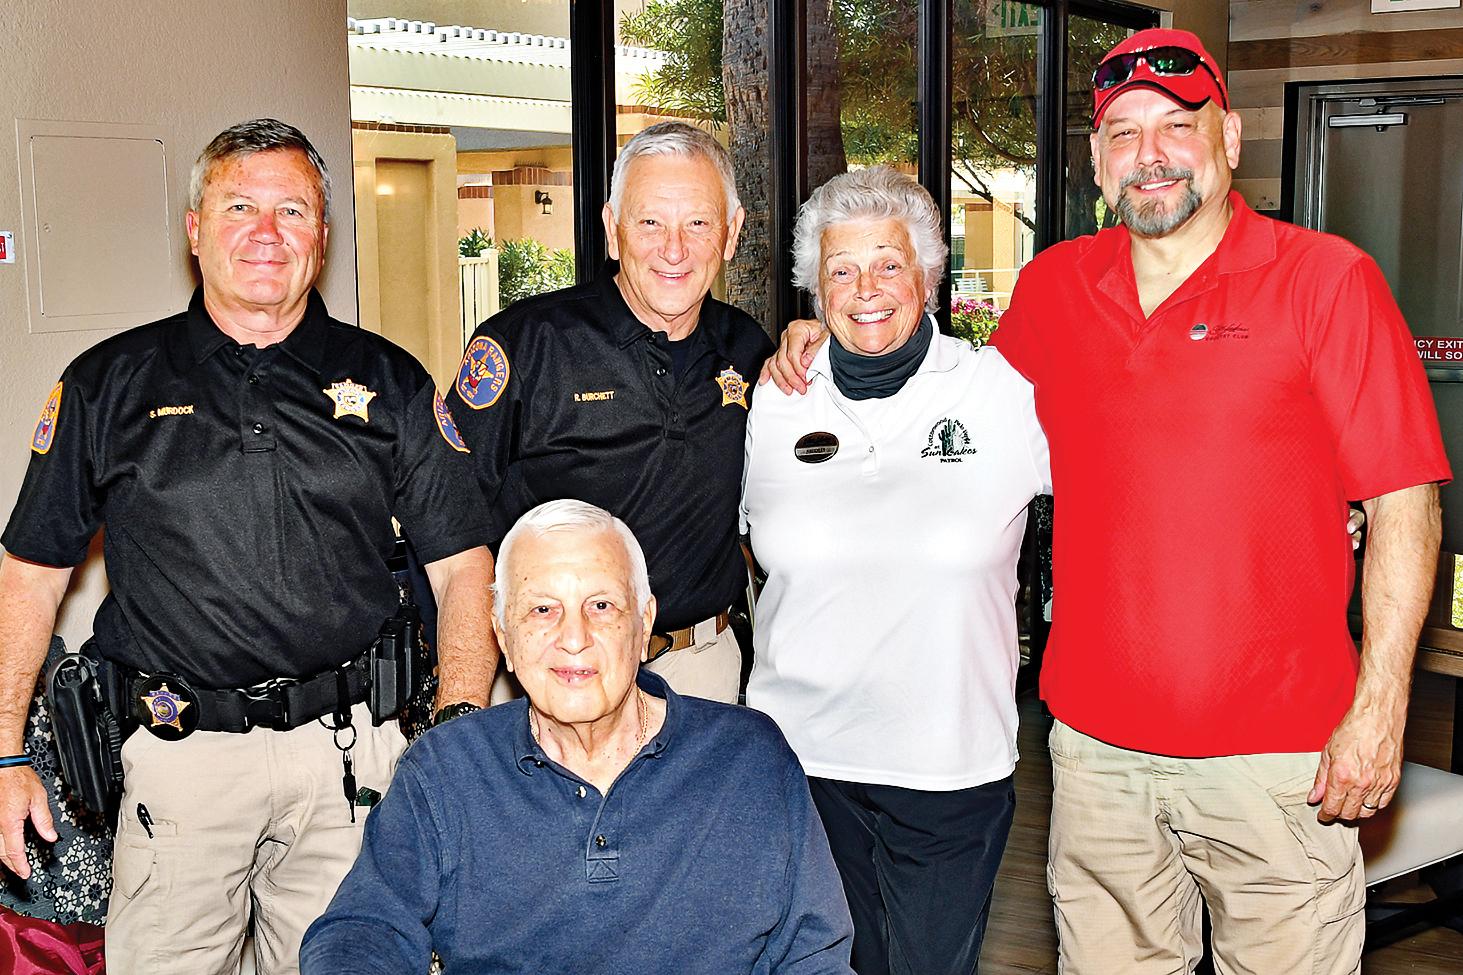 Pictured are Scott Murdock, Jim Curcio (seated), Ron Burchett, Shirley Pierini, and Tim Kelly